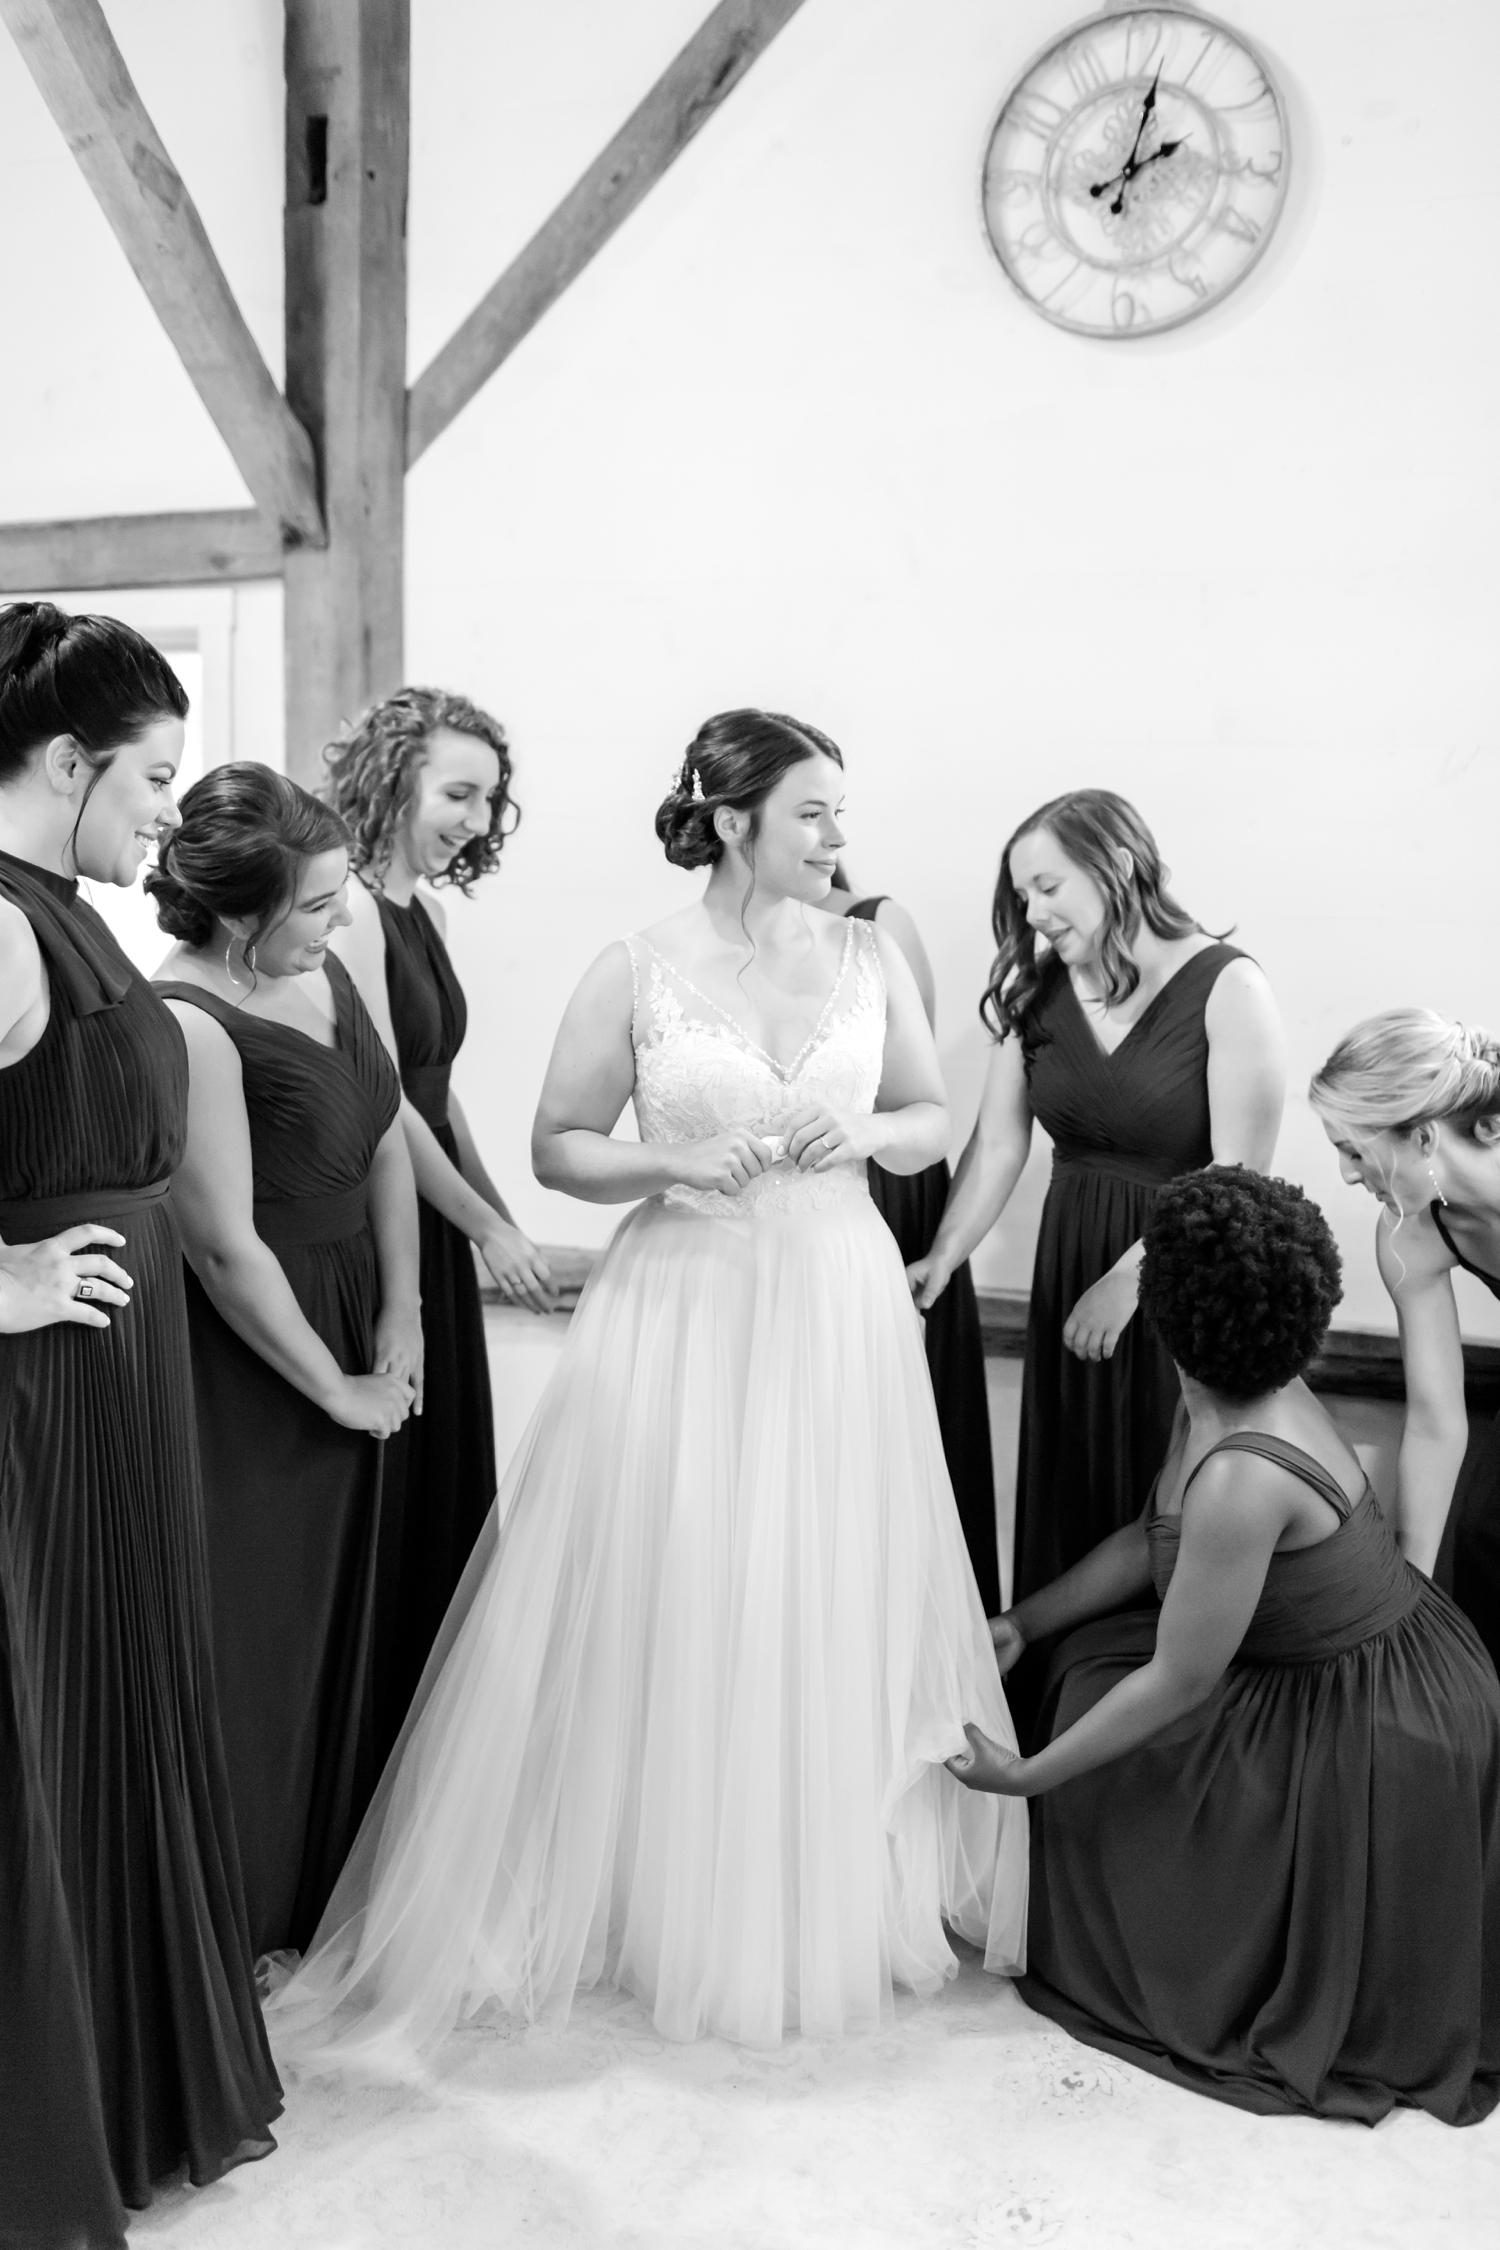 ADKINS WEDDING HIGHLIGHTS-70_The-Granary-wedding-Valley-Pike-Farm-Market-Virginia-wedding-photographer-anna-grace-photography-photo.jpg